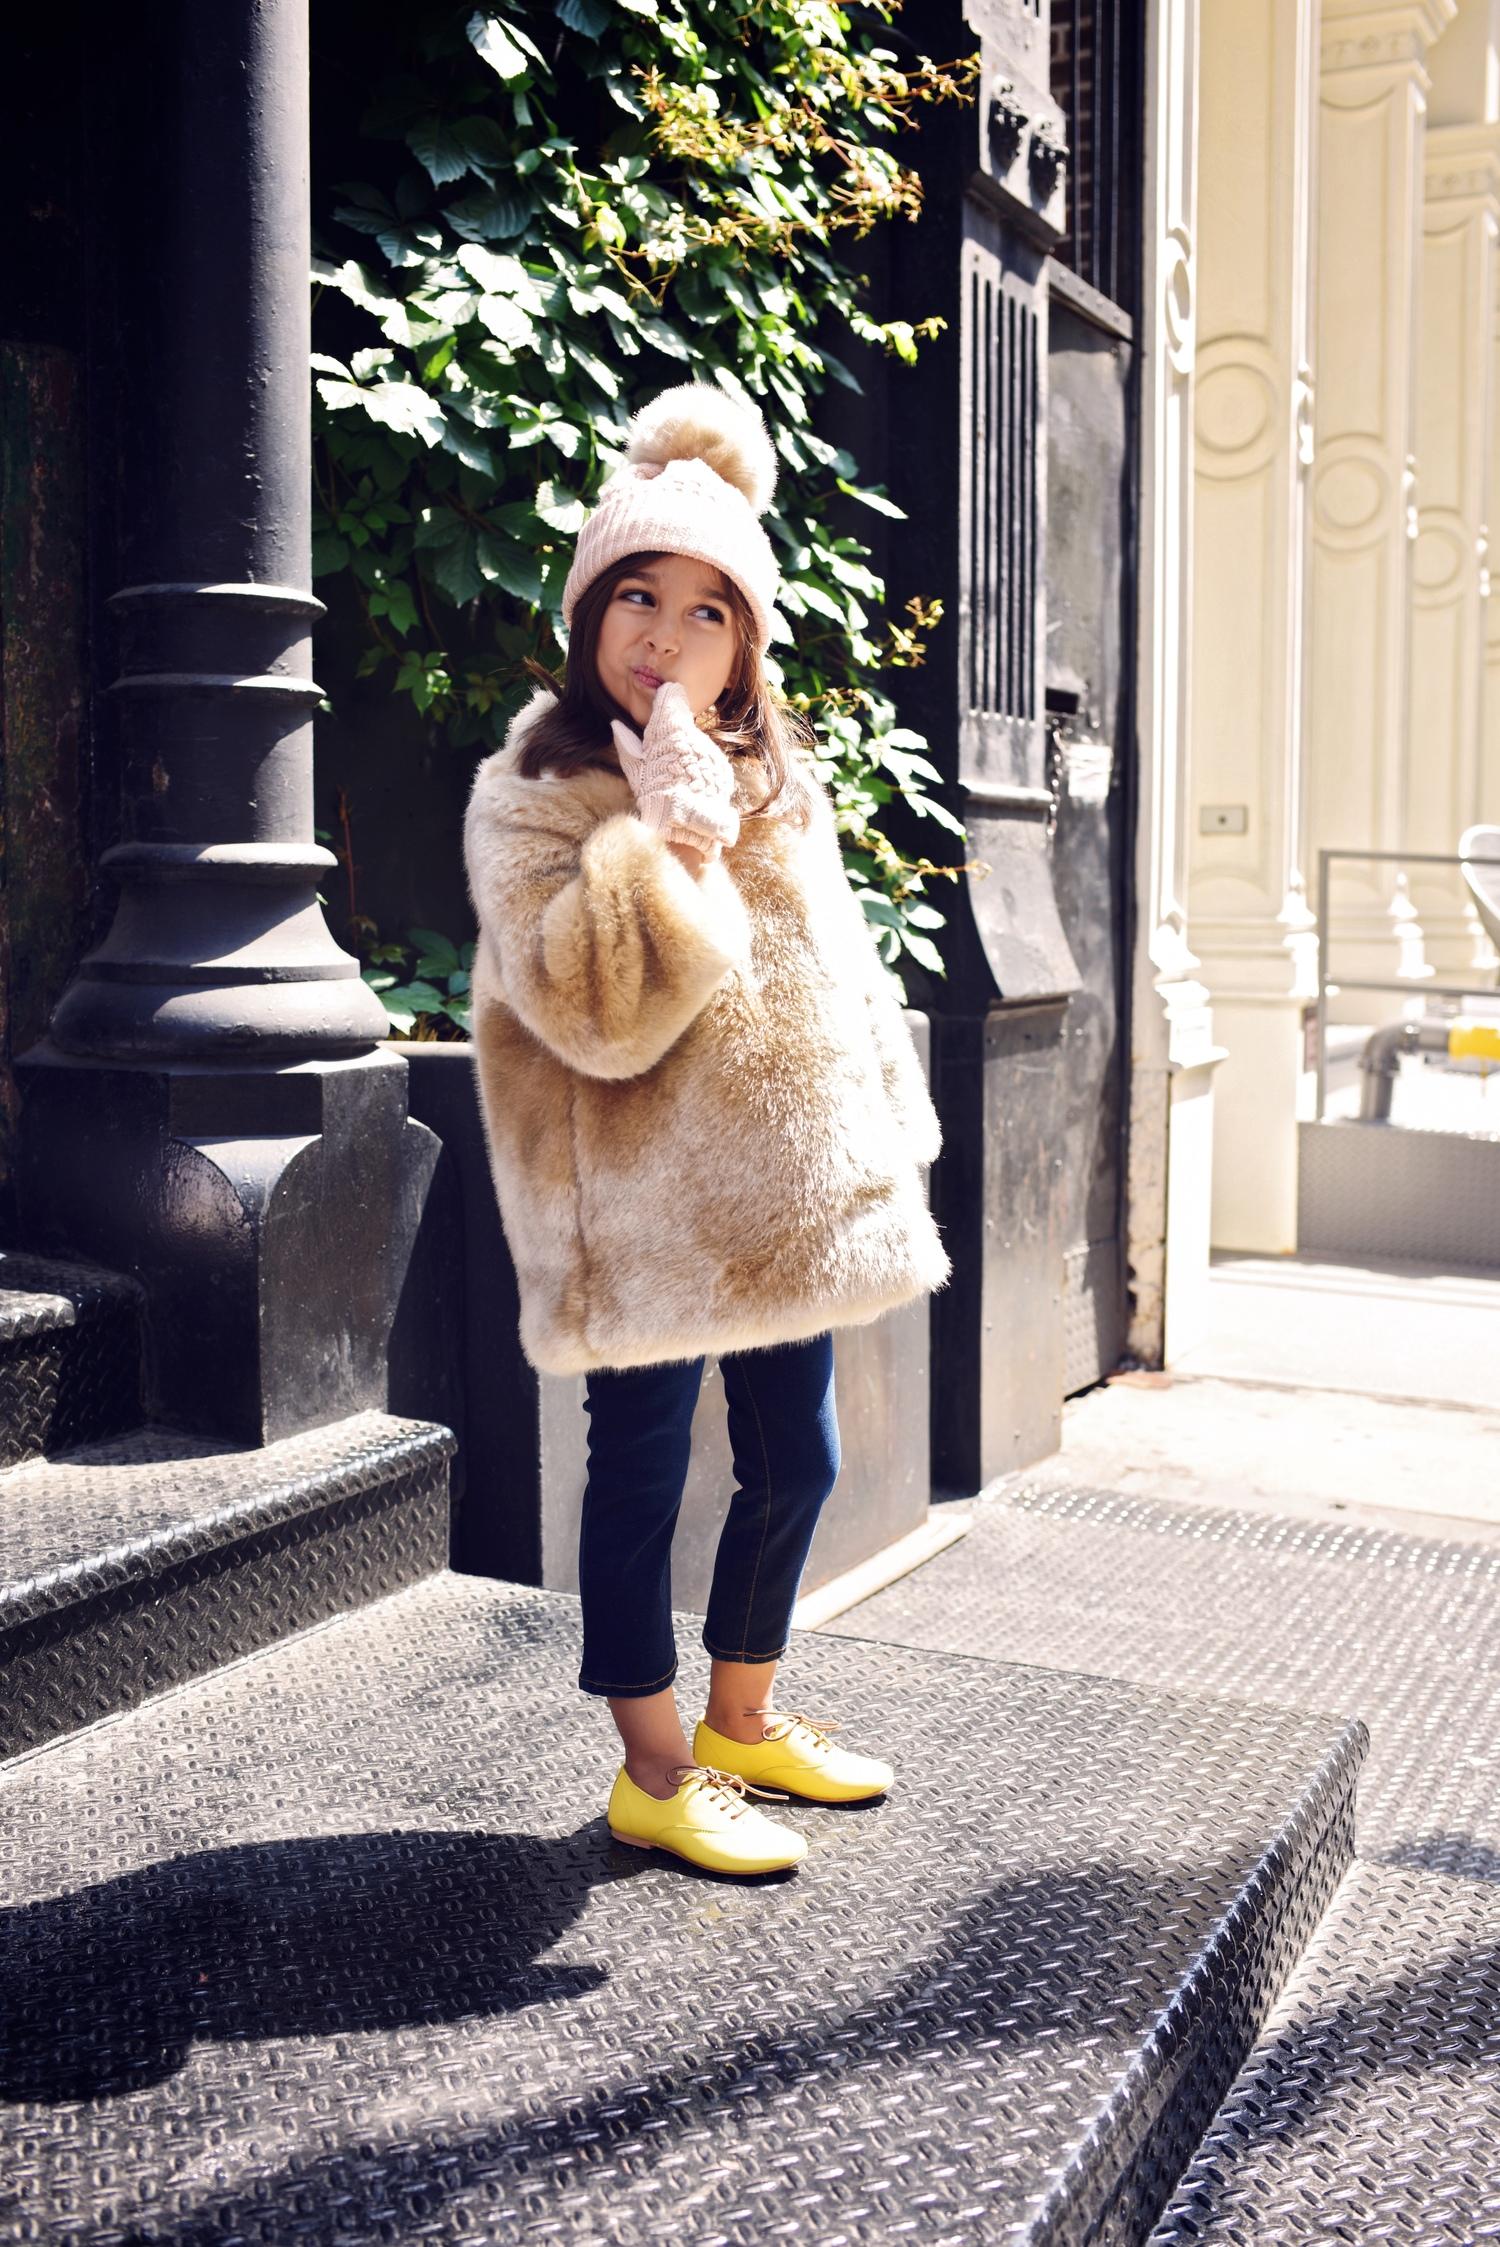 Enfant+Street+Style+by+Gina+Kim+Photography+Hucklebones-1.jpeg